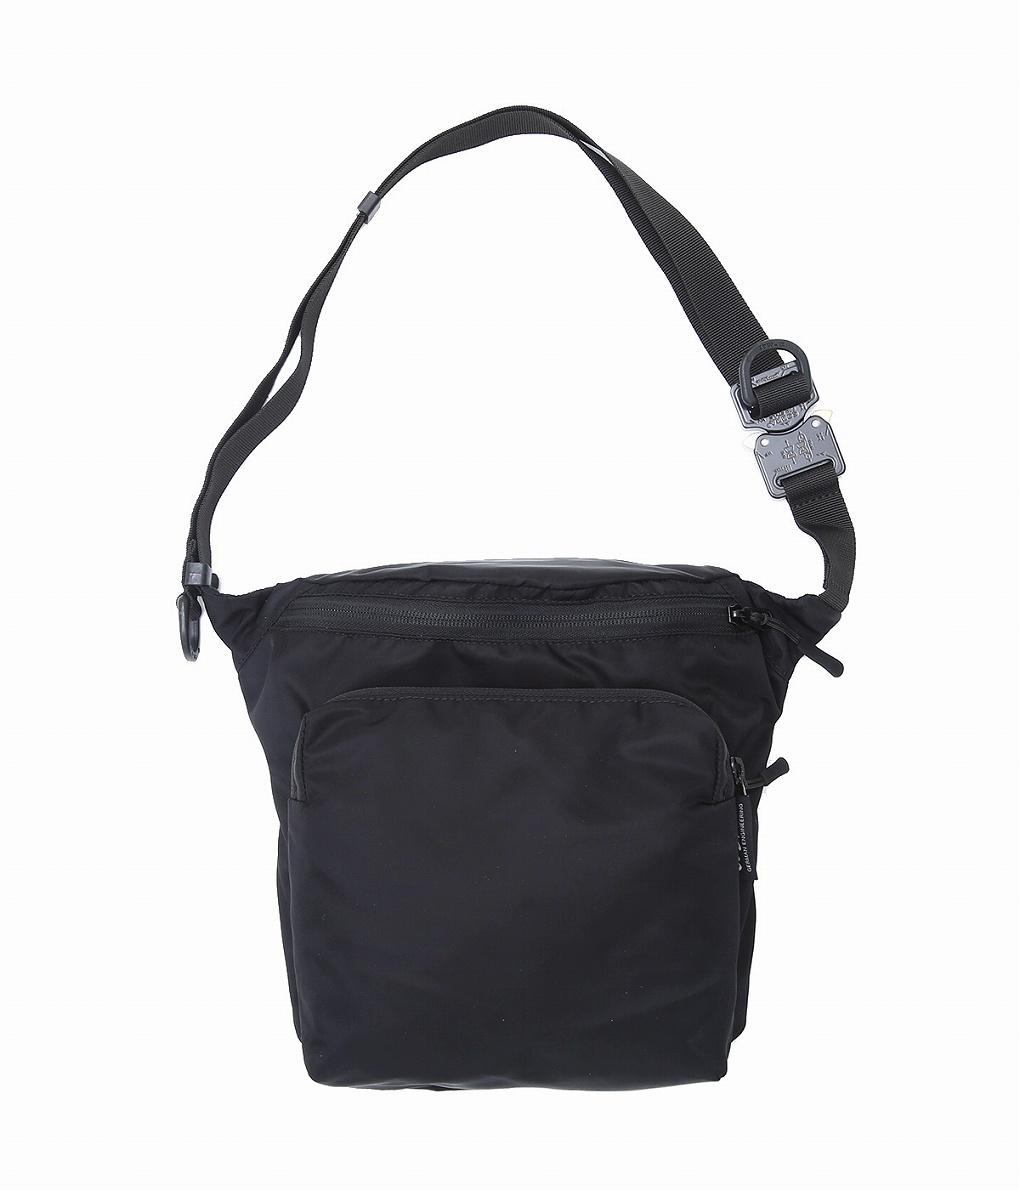 BAGJACK / バッグジャック : 別注hipbag DP(LIMONTA NYLON) : ヒップバッグバッグ ポーチ ボディバッグ 別注 限定 メンズ : HIPBAG-DP 【MUS】